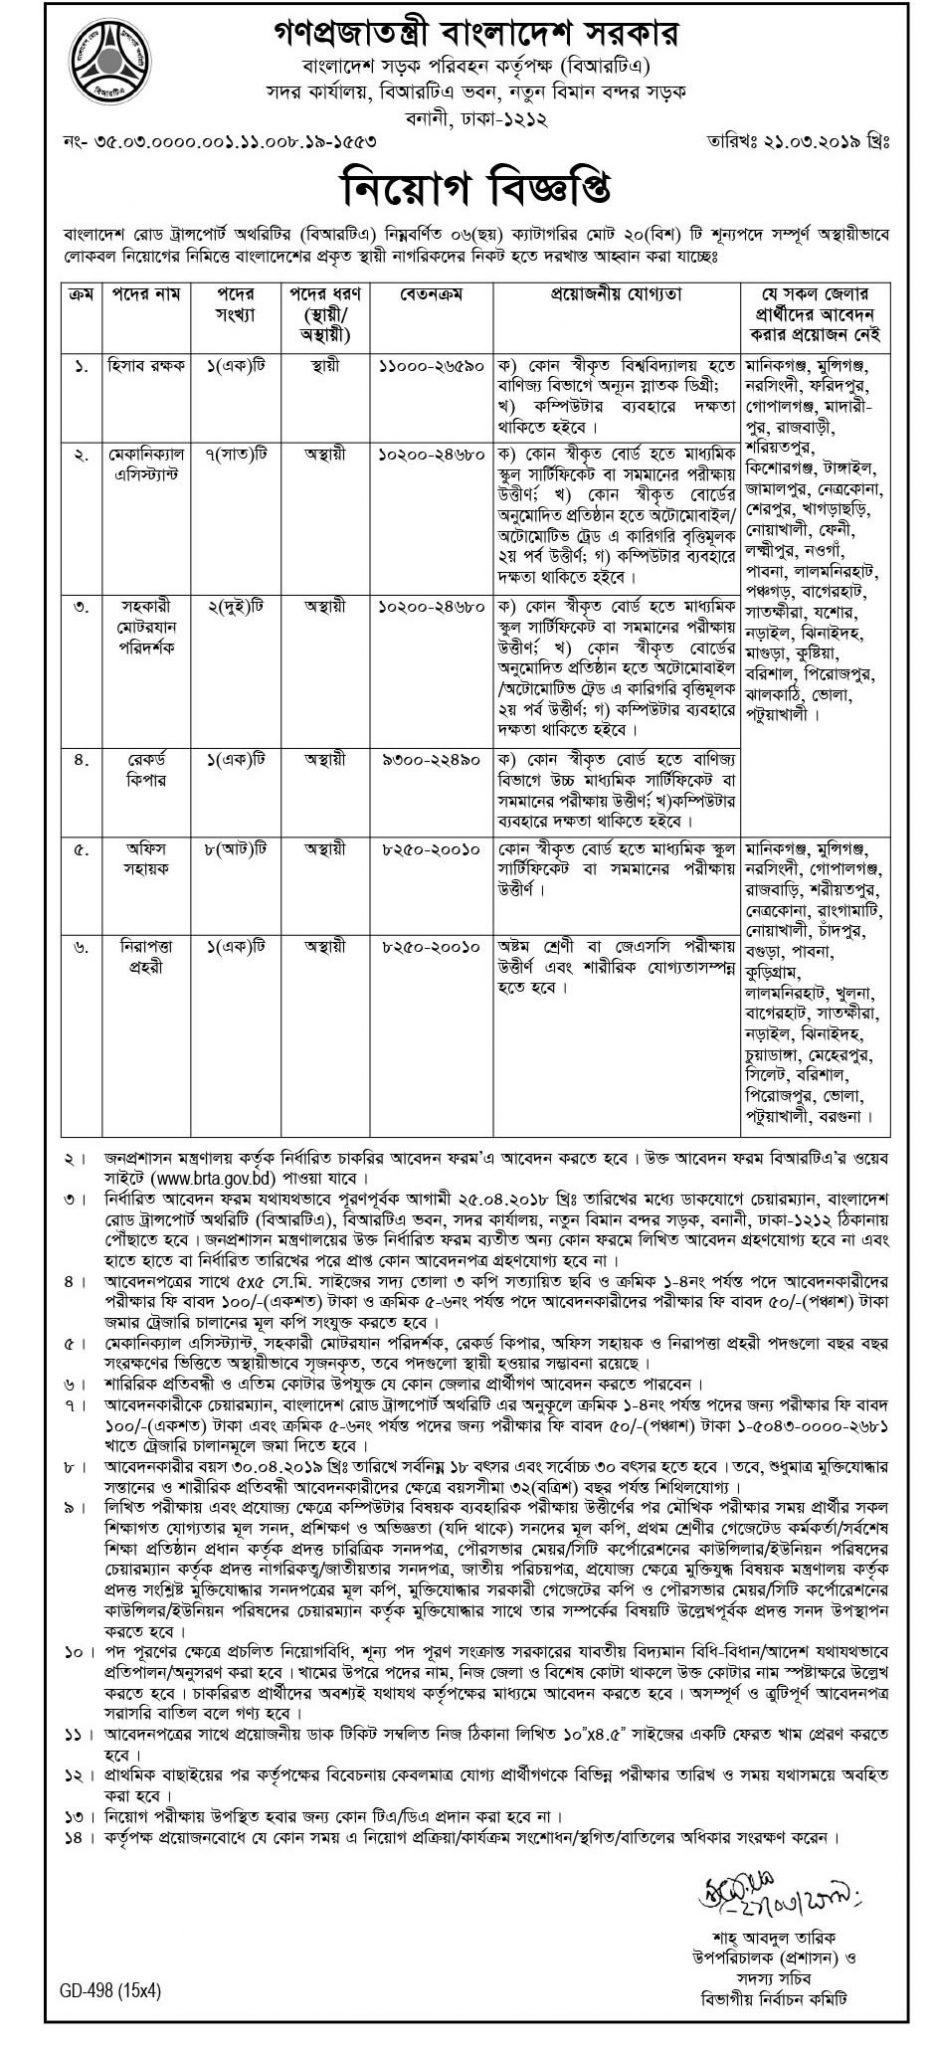 Prothom Alo Weekly Jobs Newspaper 2019